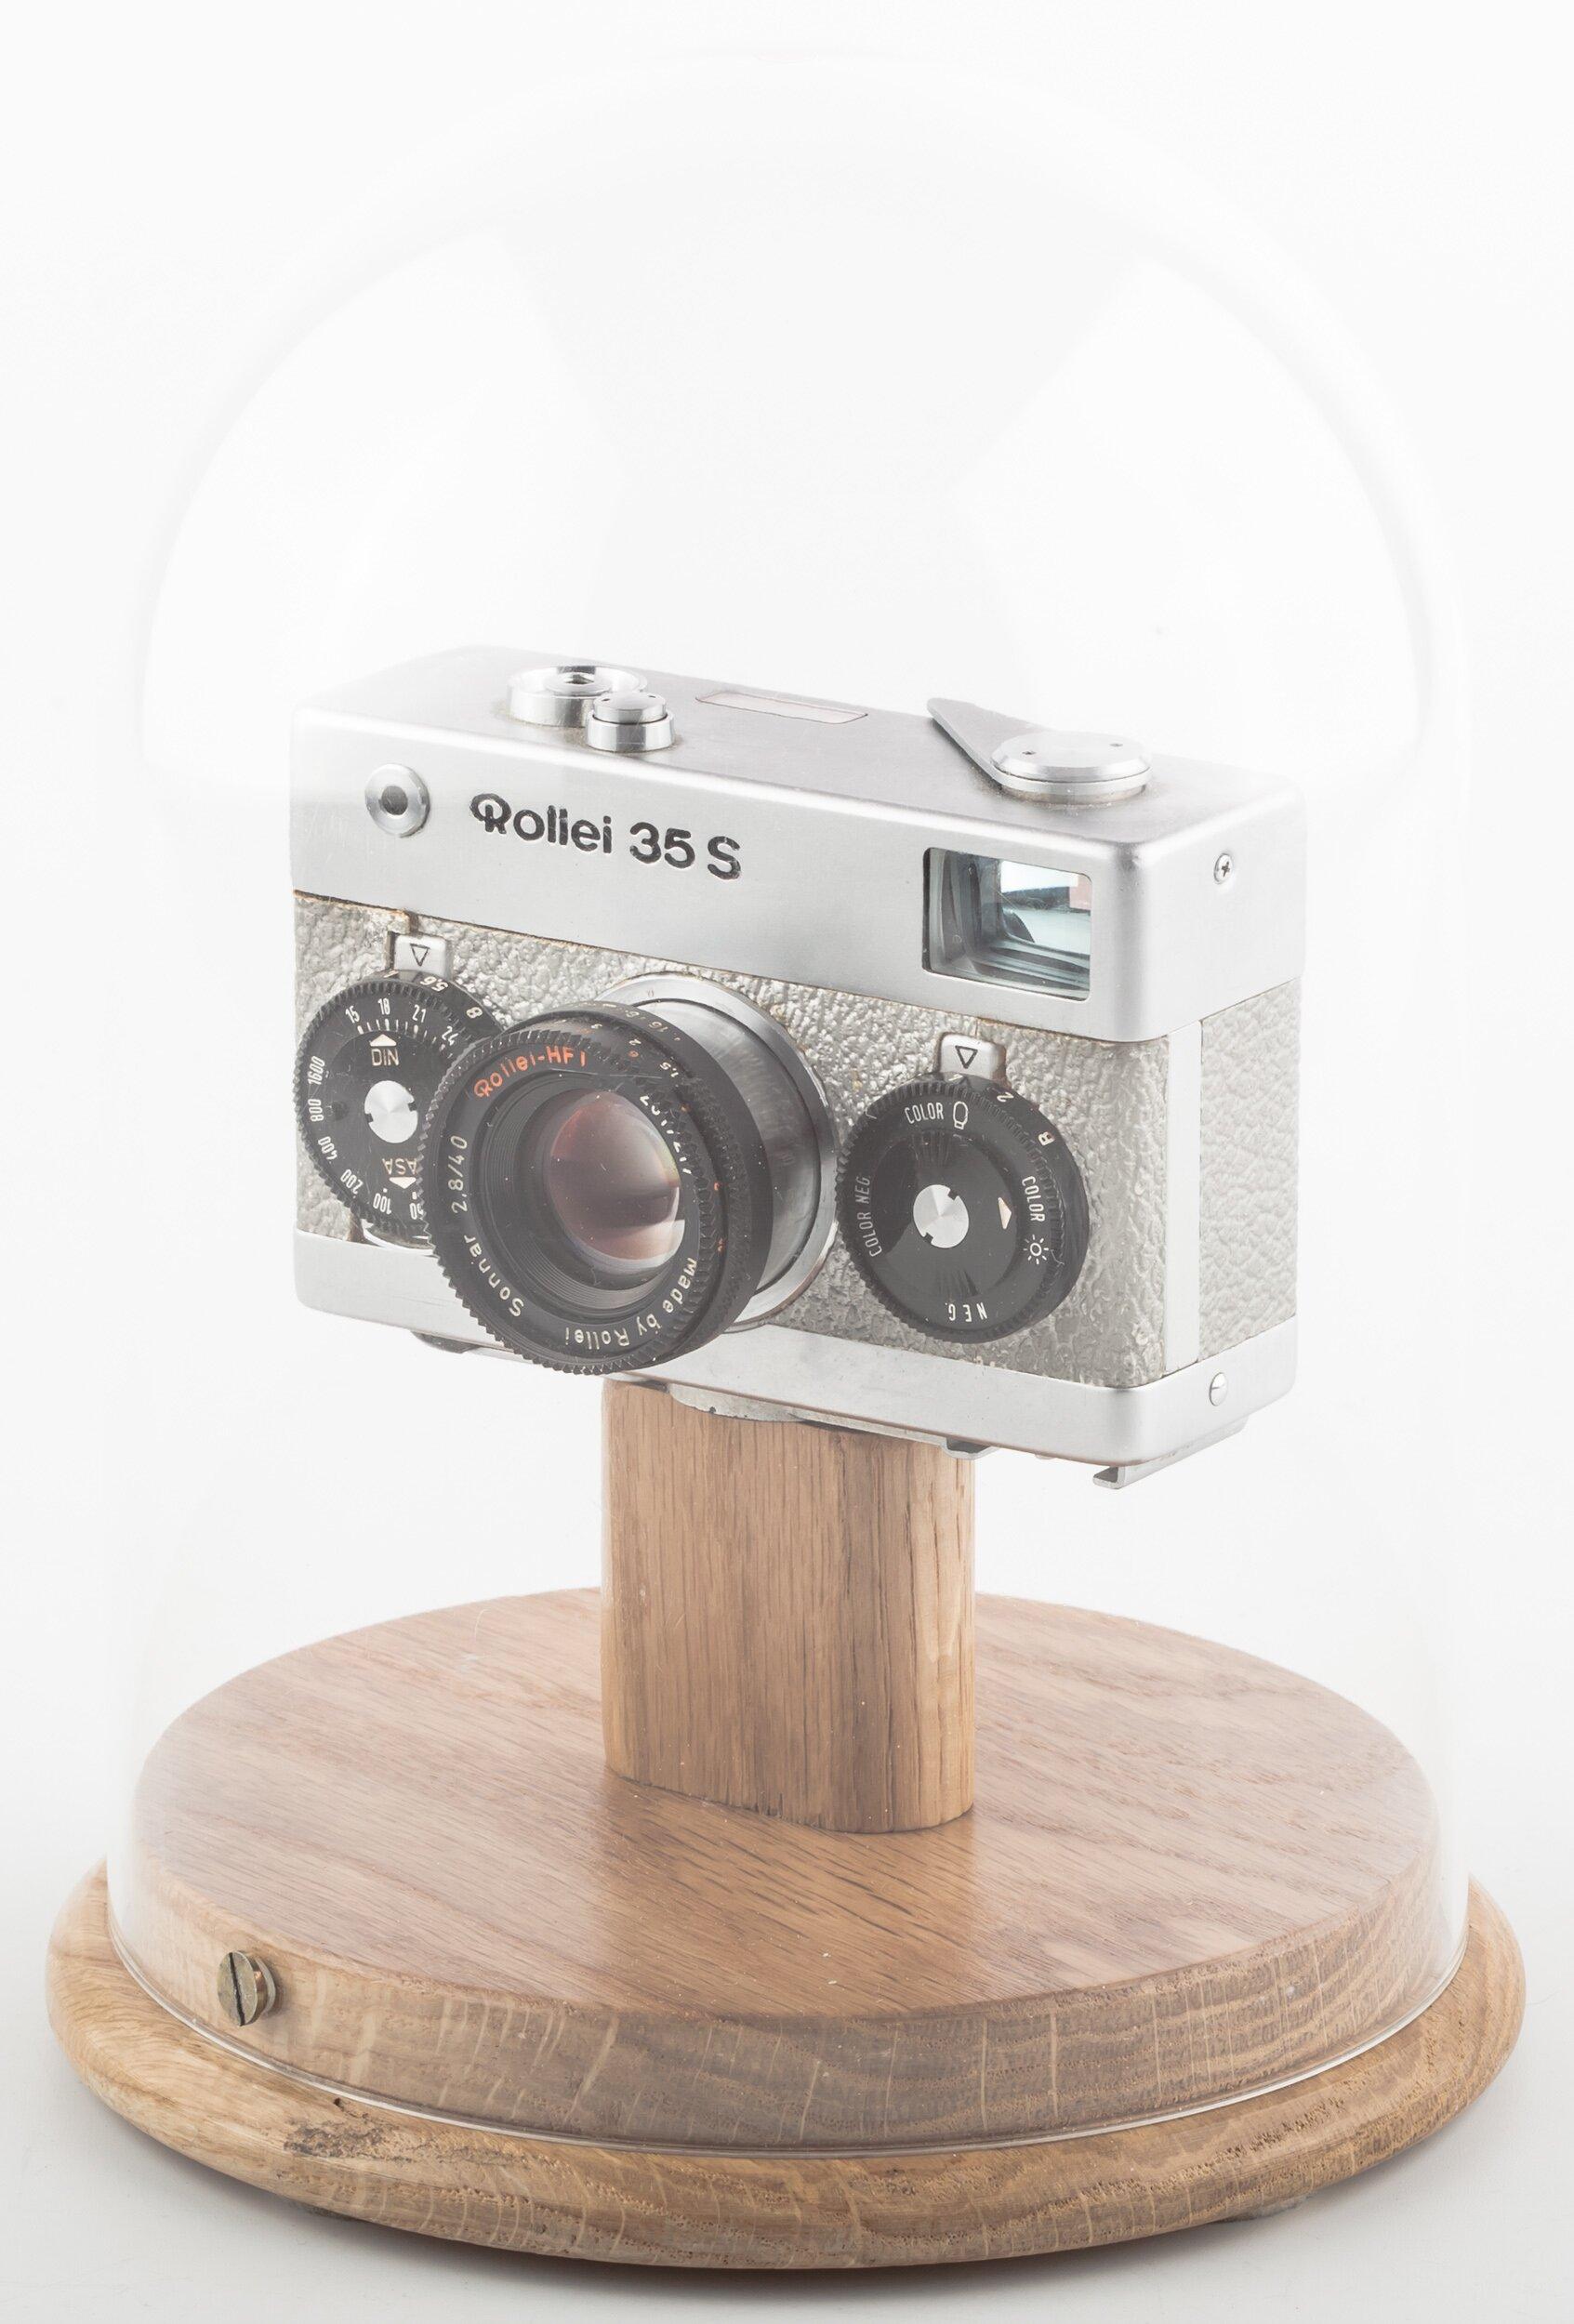 Rollei 35 S silber mit Sonnar 2,8/40mm HFT Limited Edition